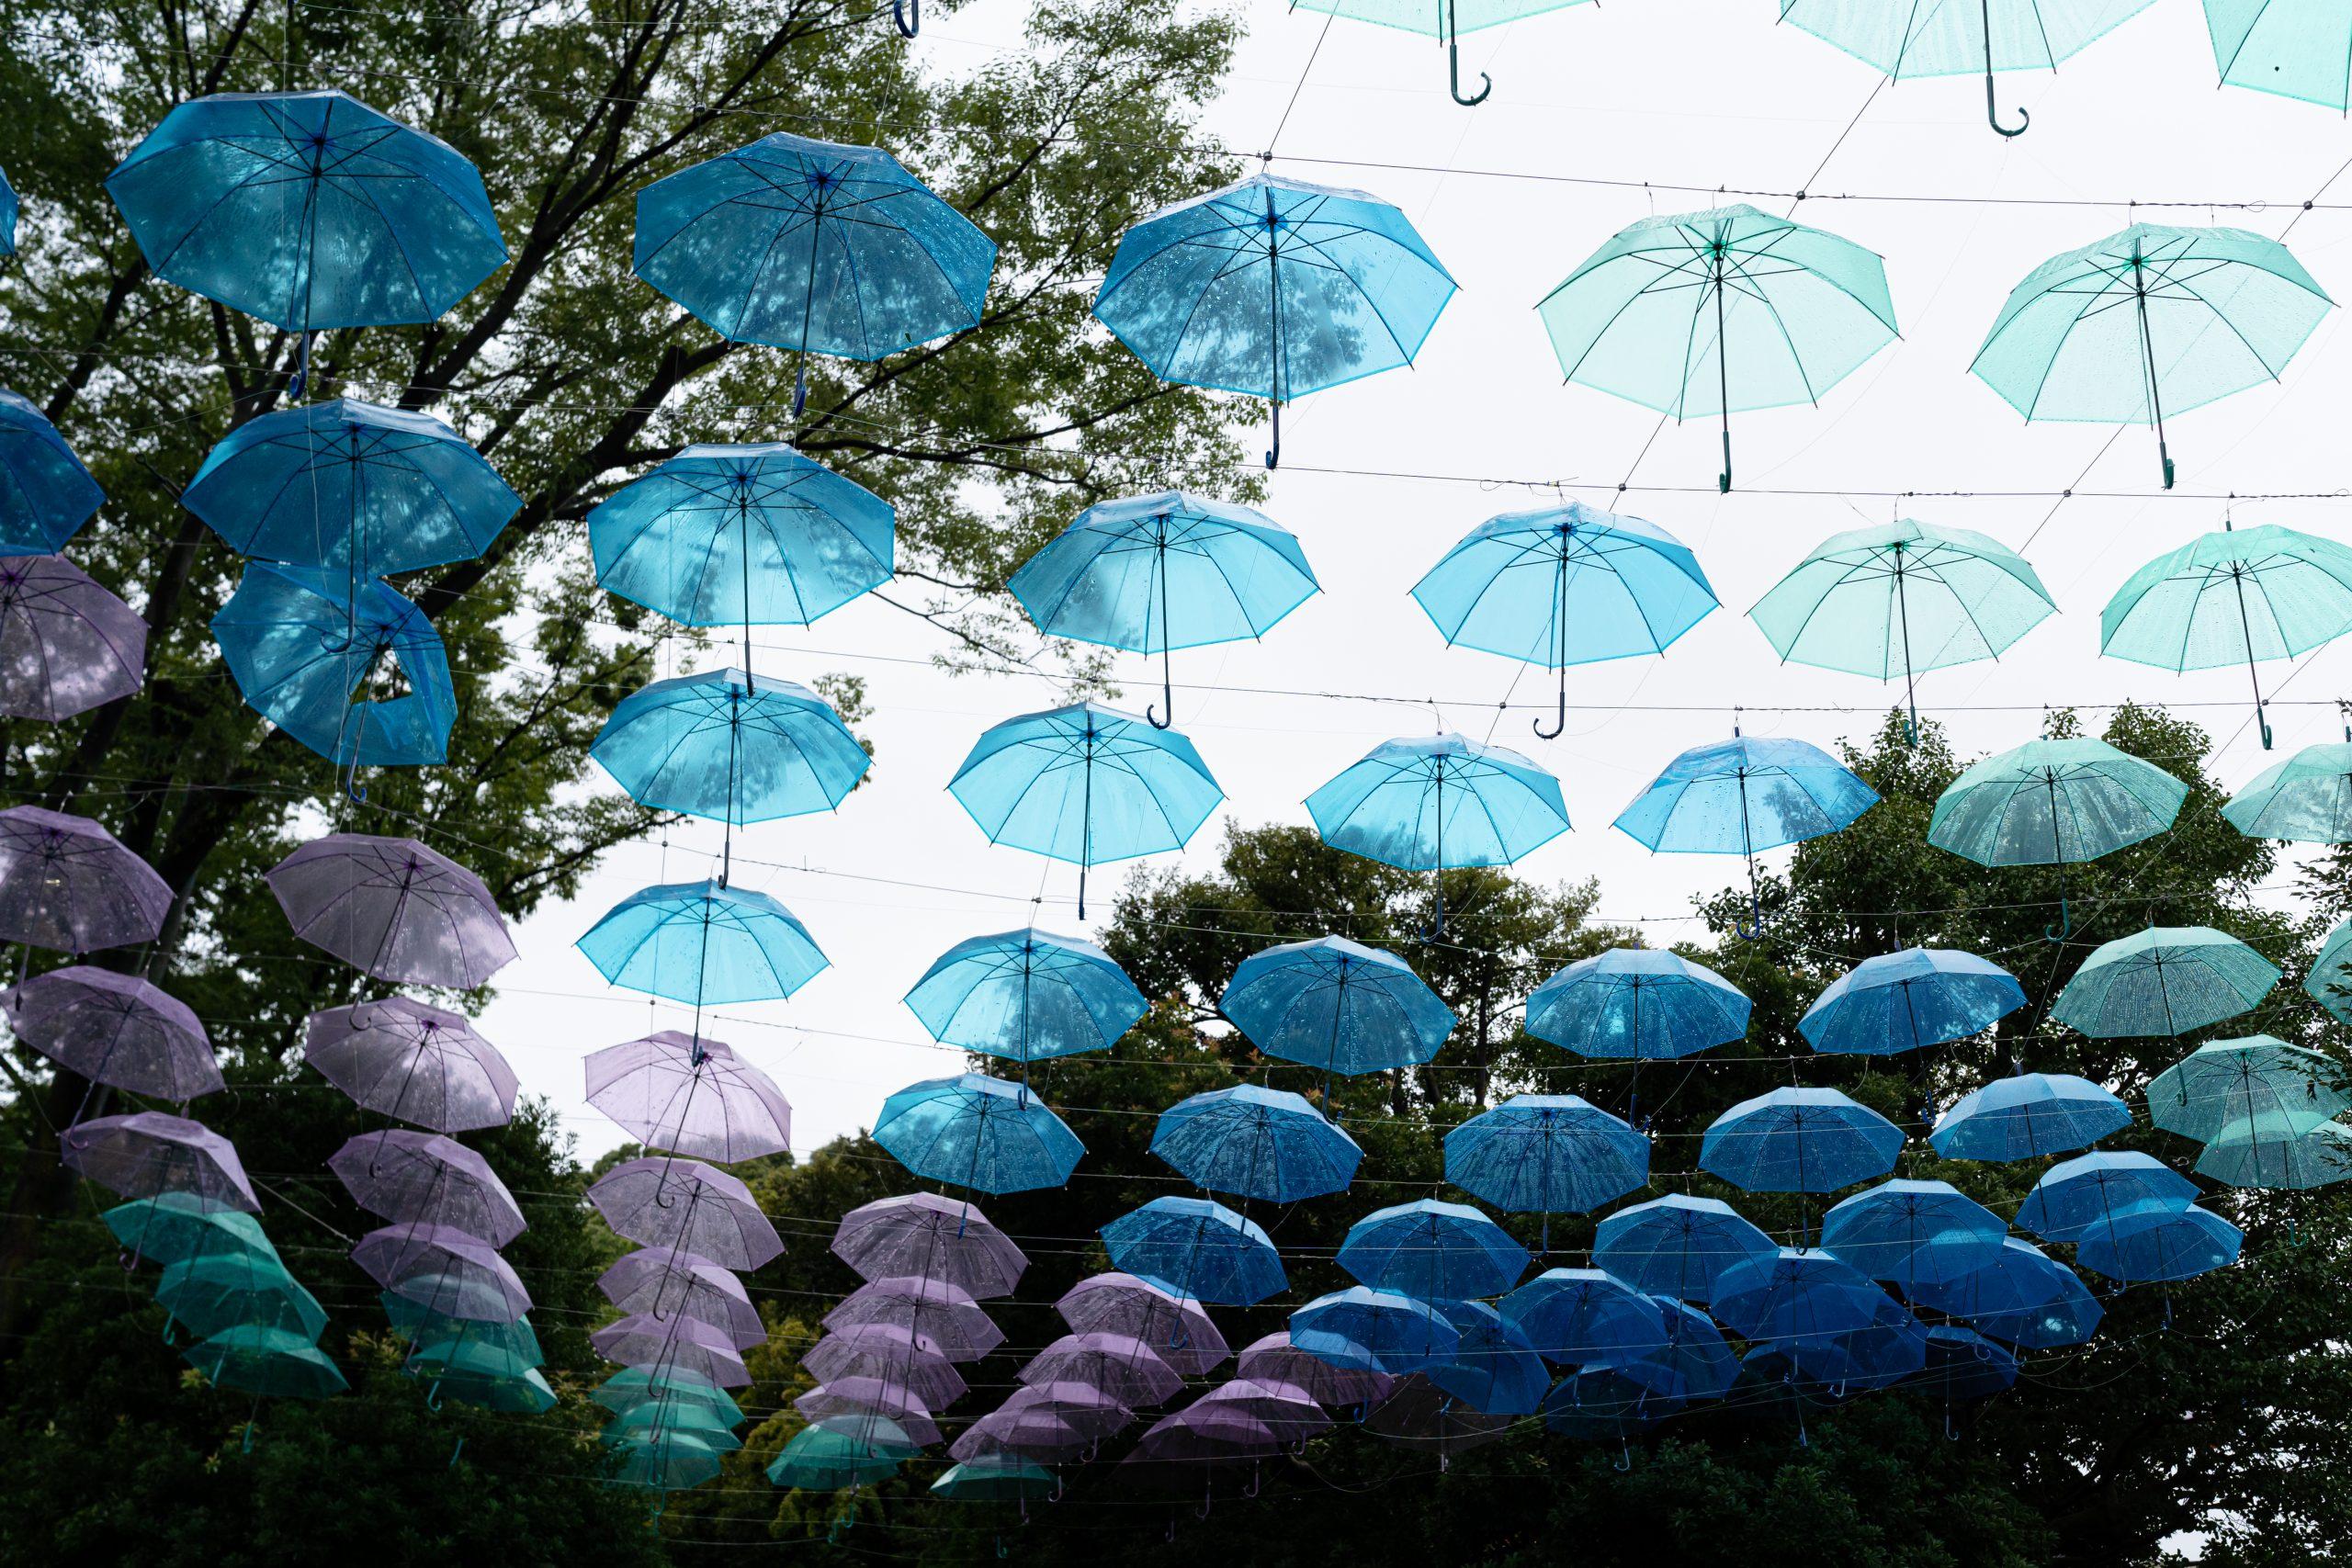 【SONY】夏の終わりの雨の日散歩